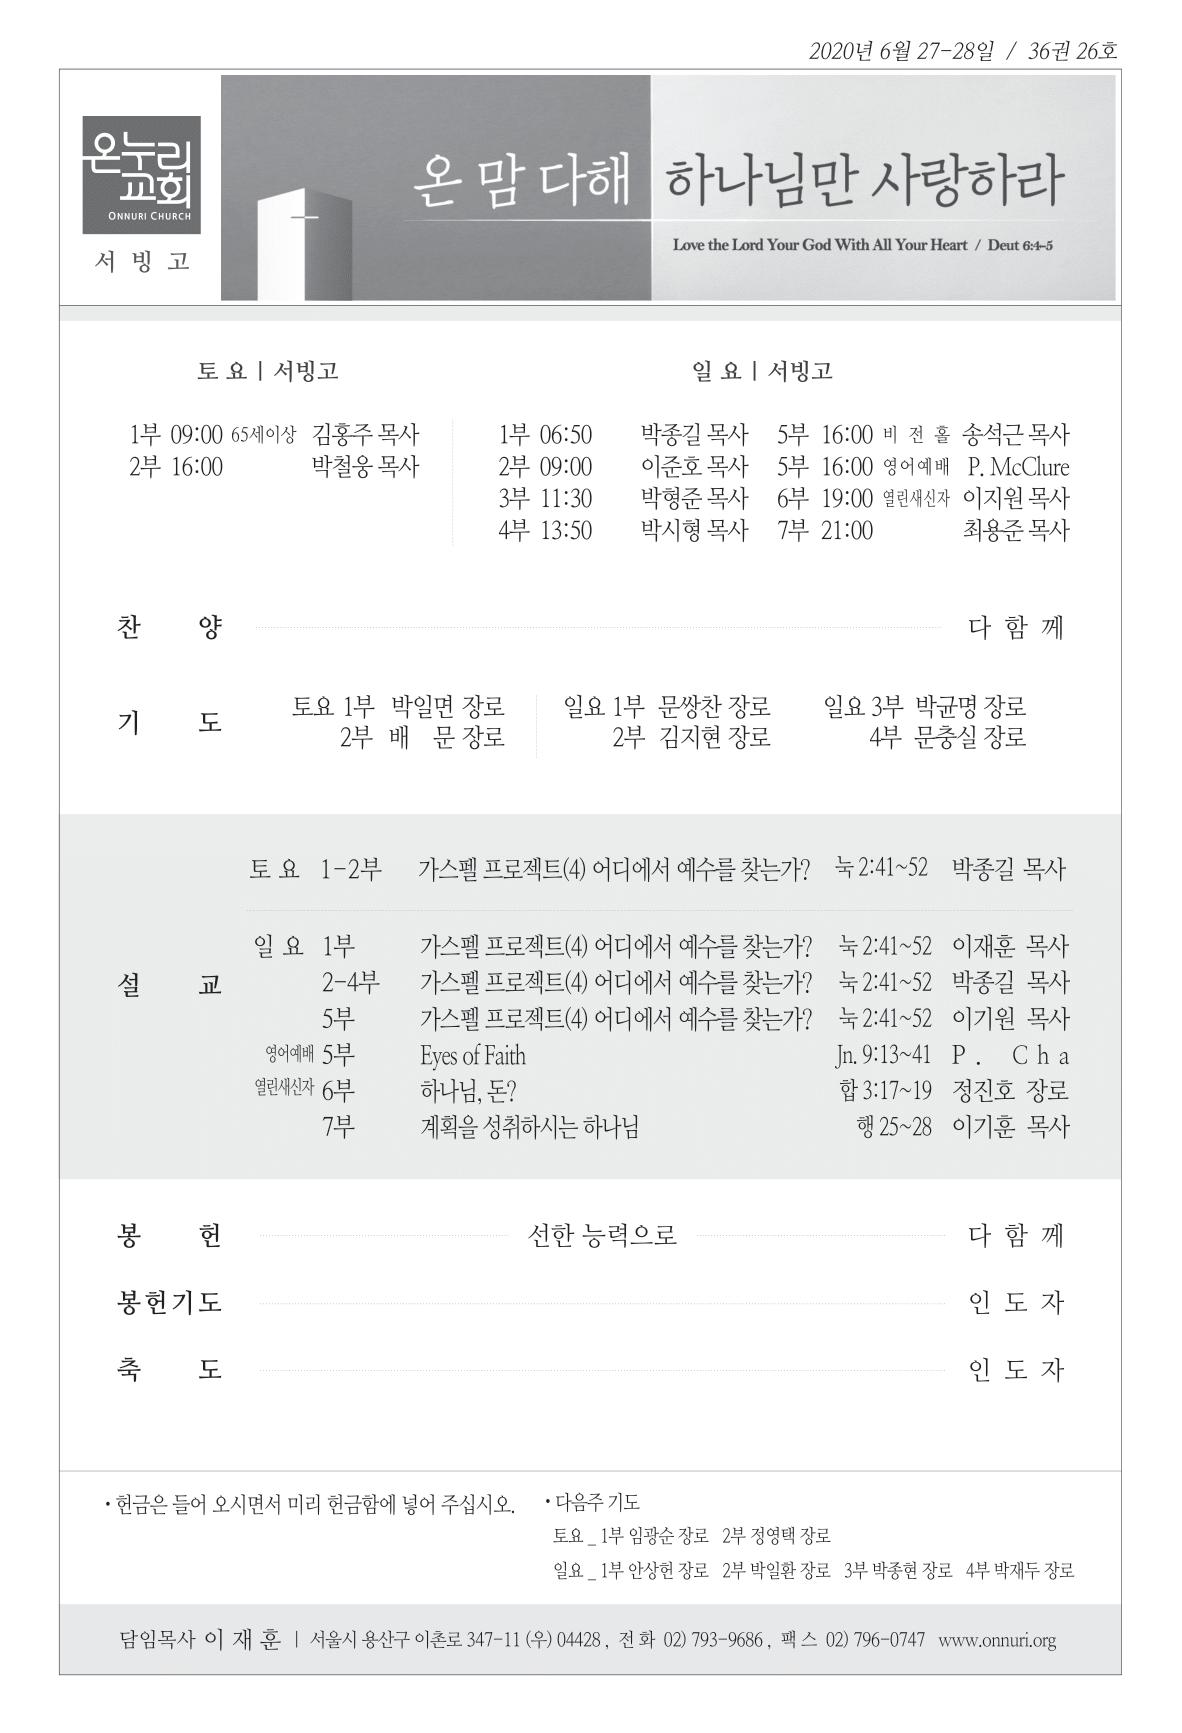 seobingo_200627